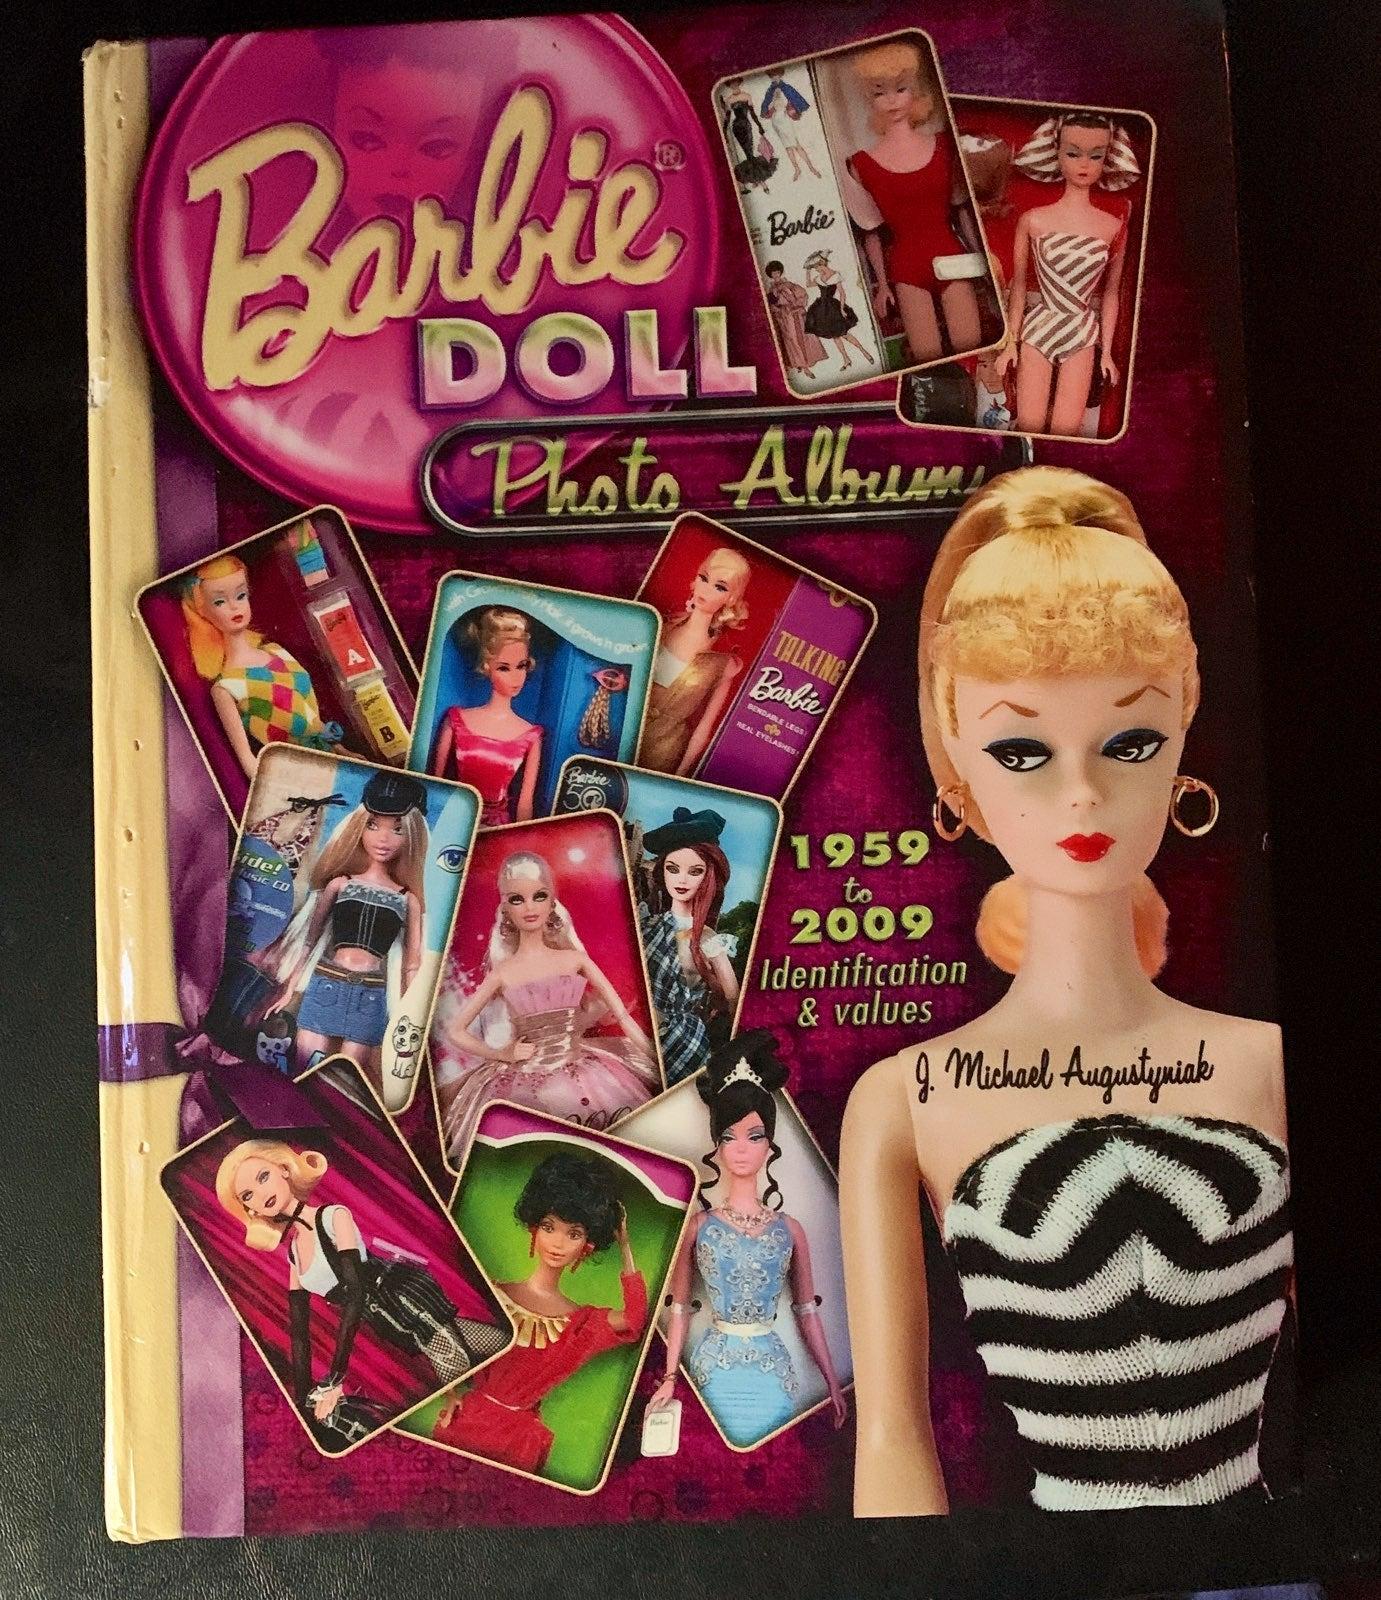 Barbie Doll Photo Album 1959 to 2009 Il